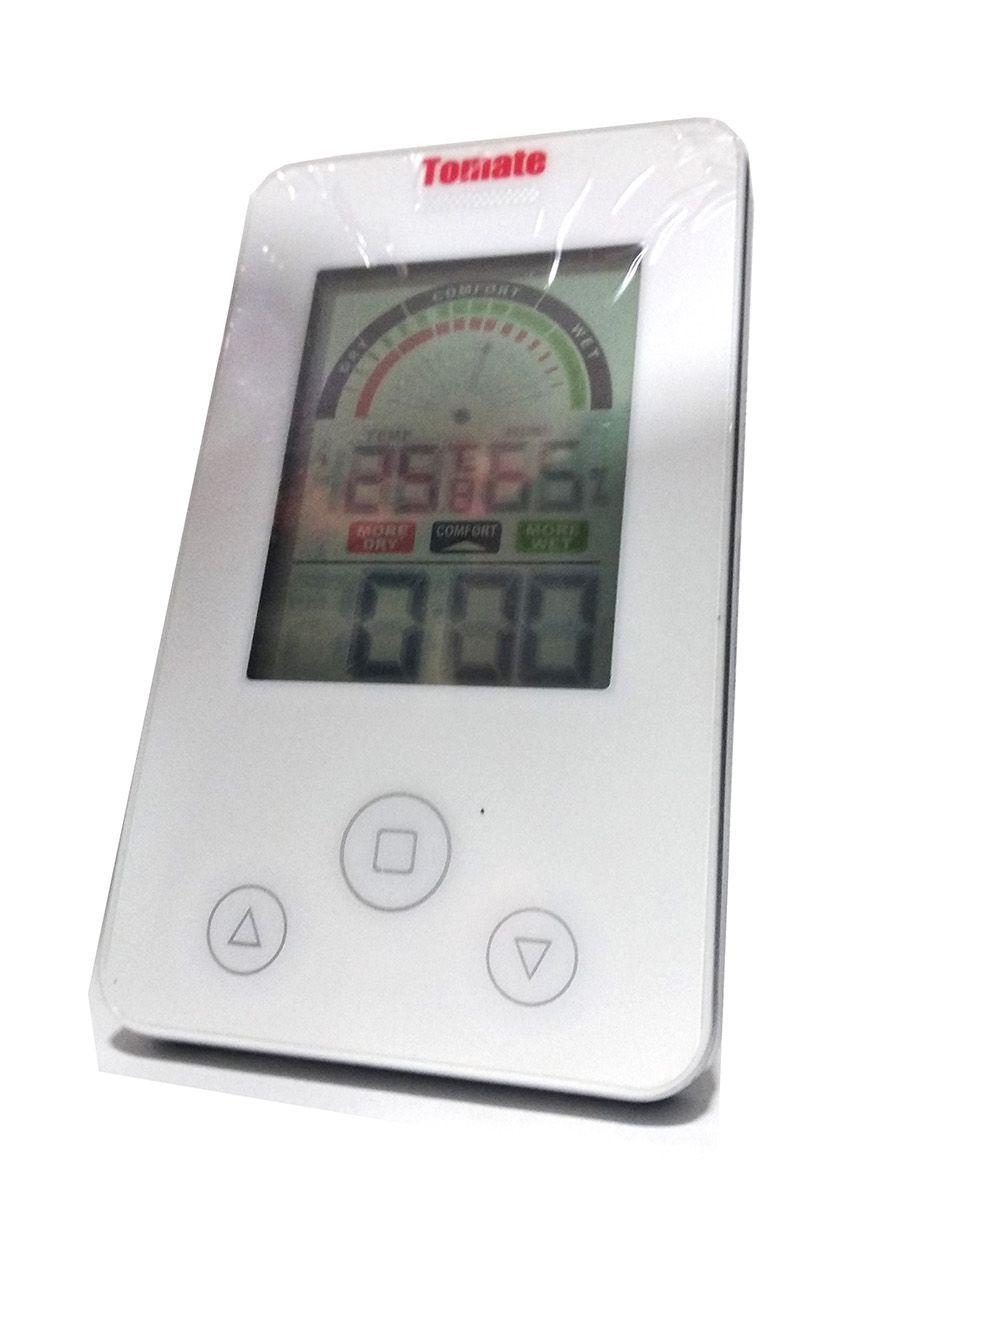 Relógio Termo Higrômetro Temperatura e Umidade PD-005 Tomate